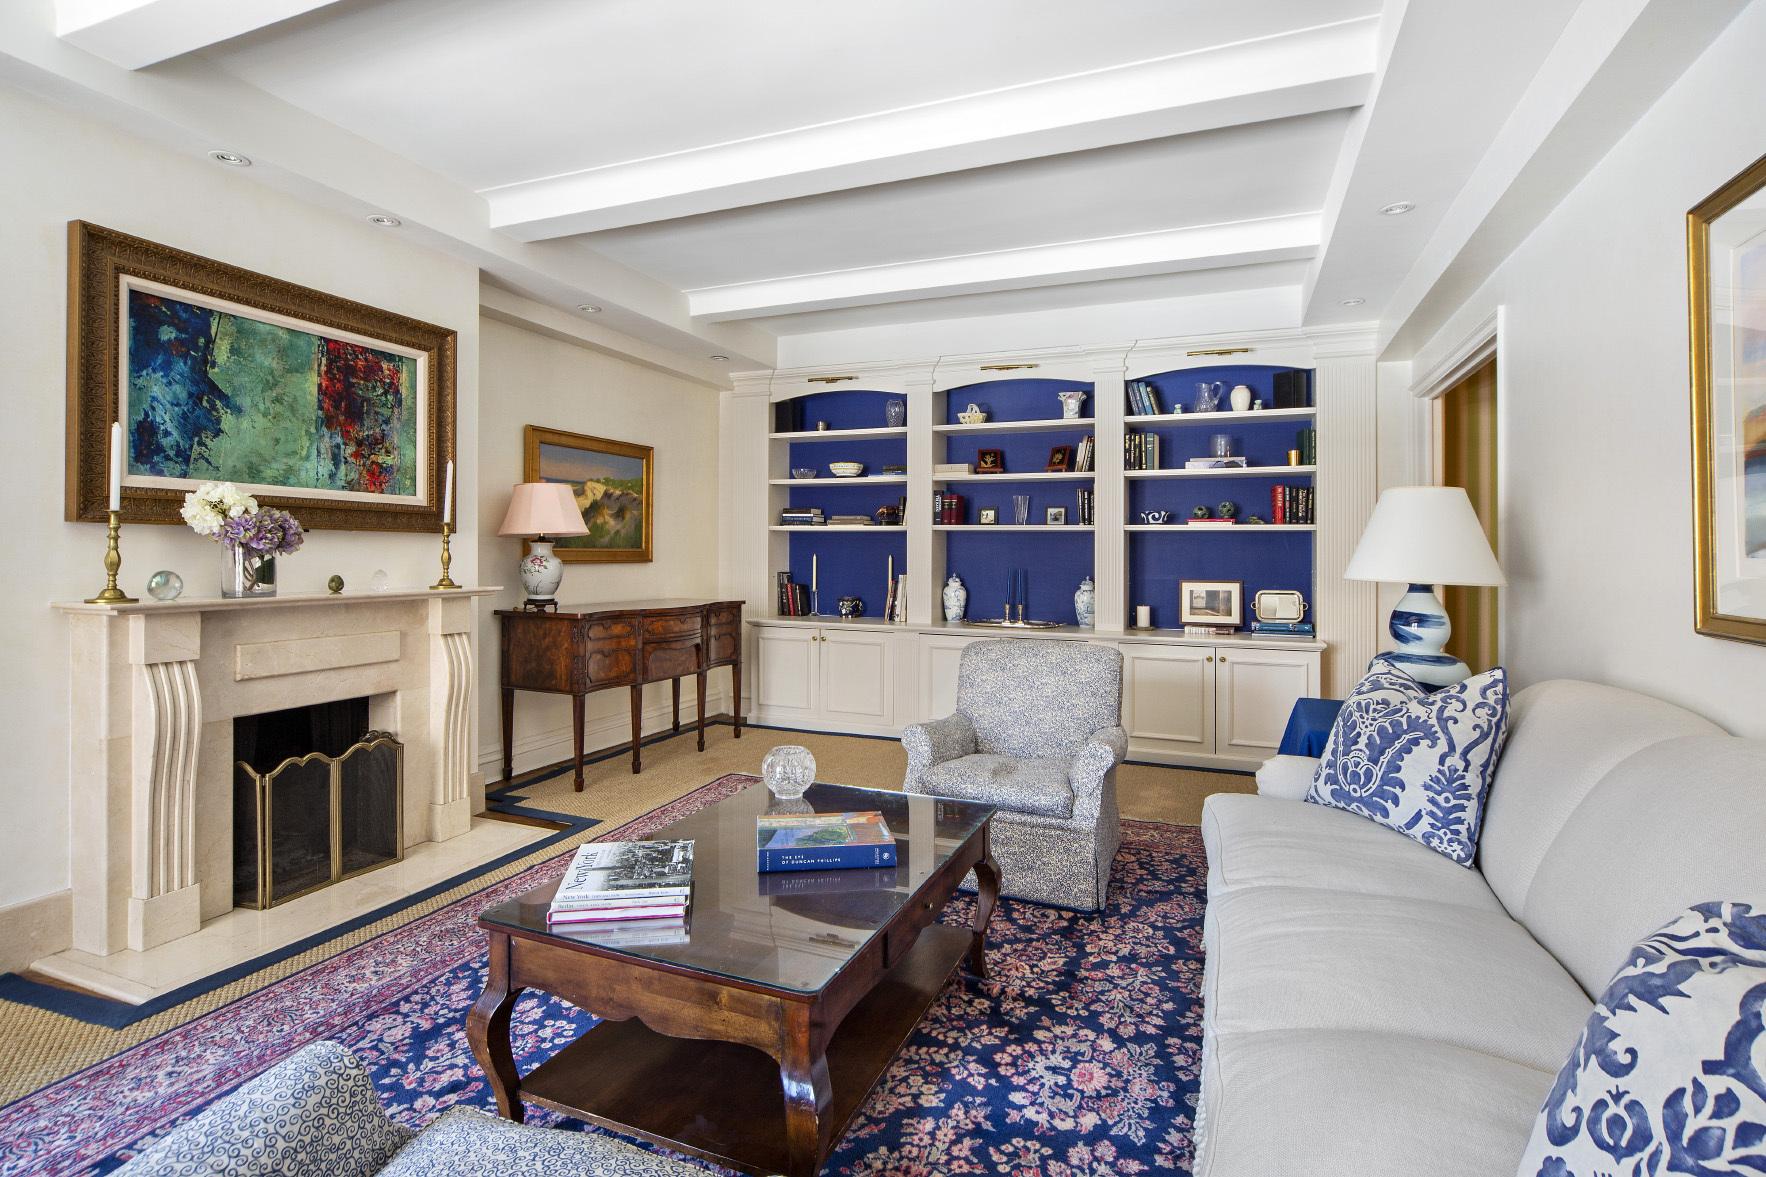 living room inside 136 East 64th Street New York, NY, USA